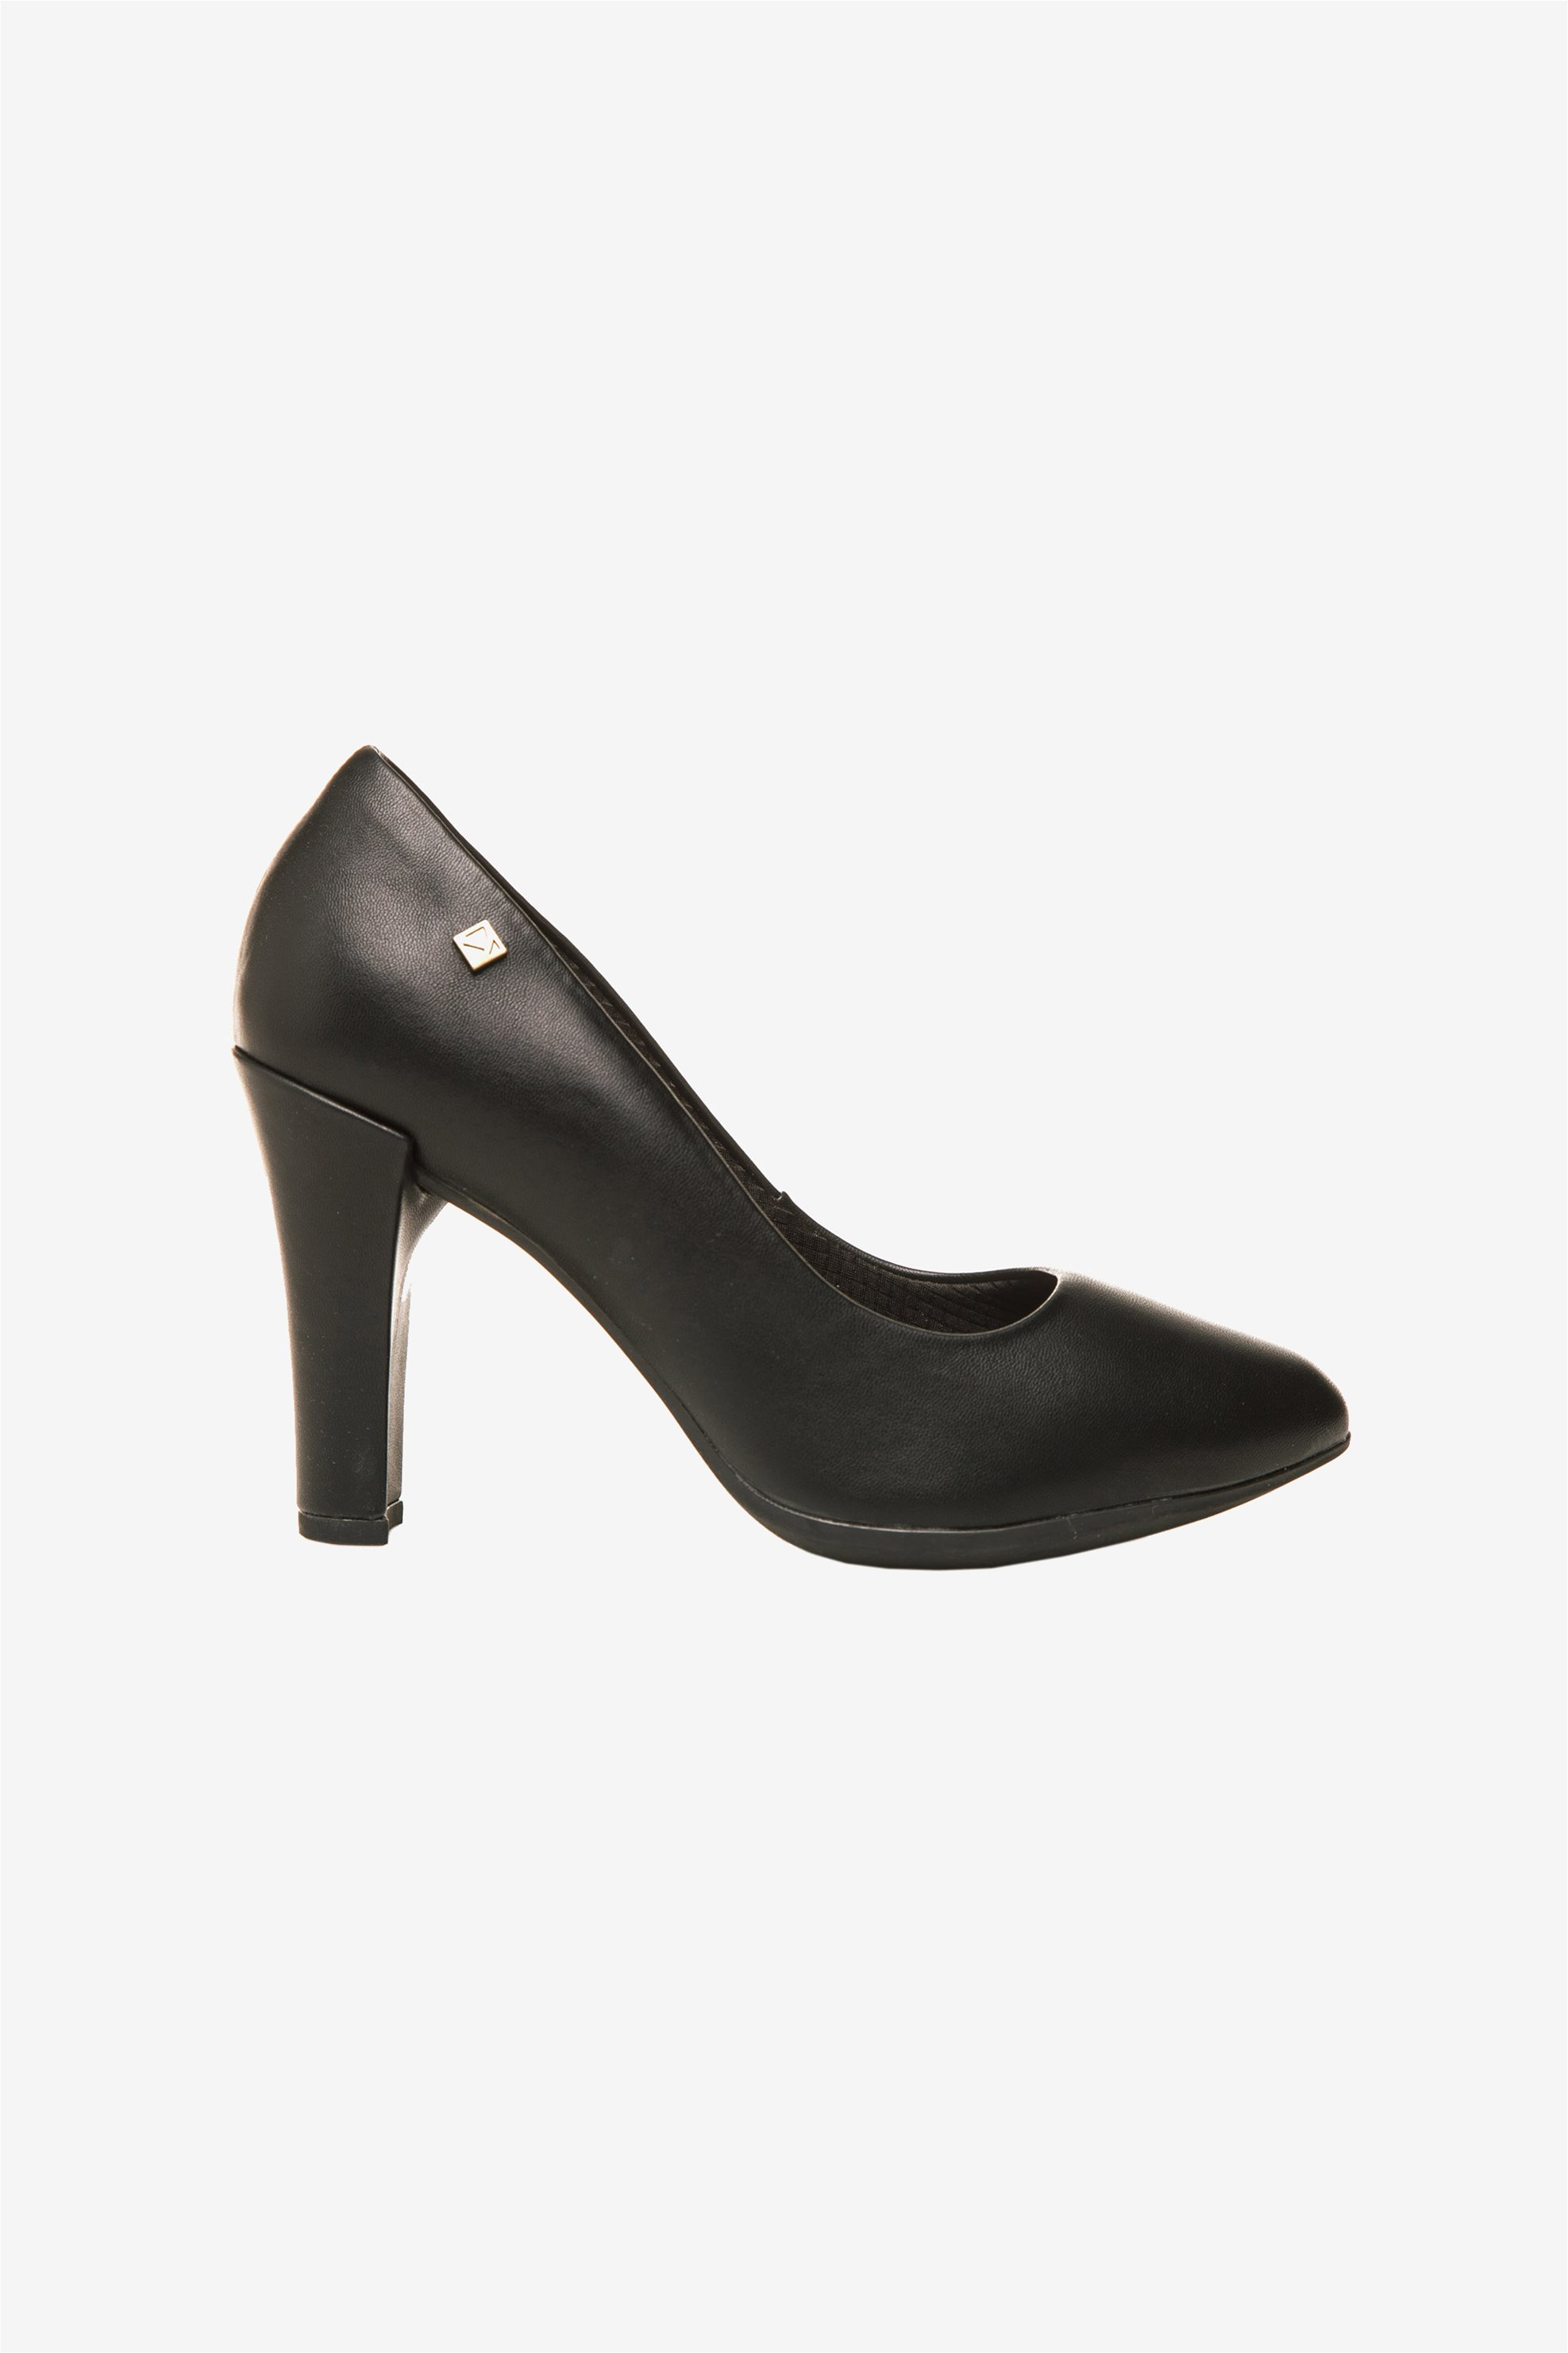 Piccadilly γυναικείες ψηλές γόβες με στρογγυλή μύτη - 69500100000007 - Μαύρο